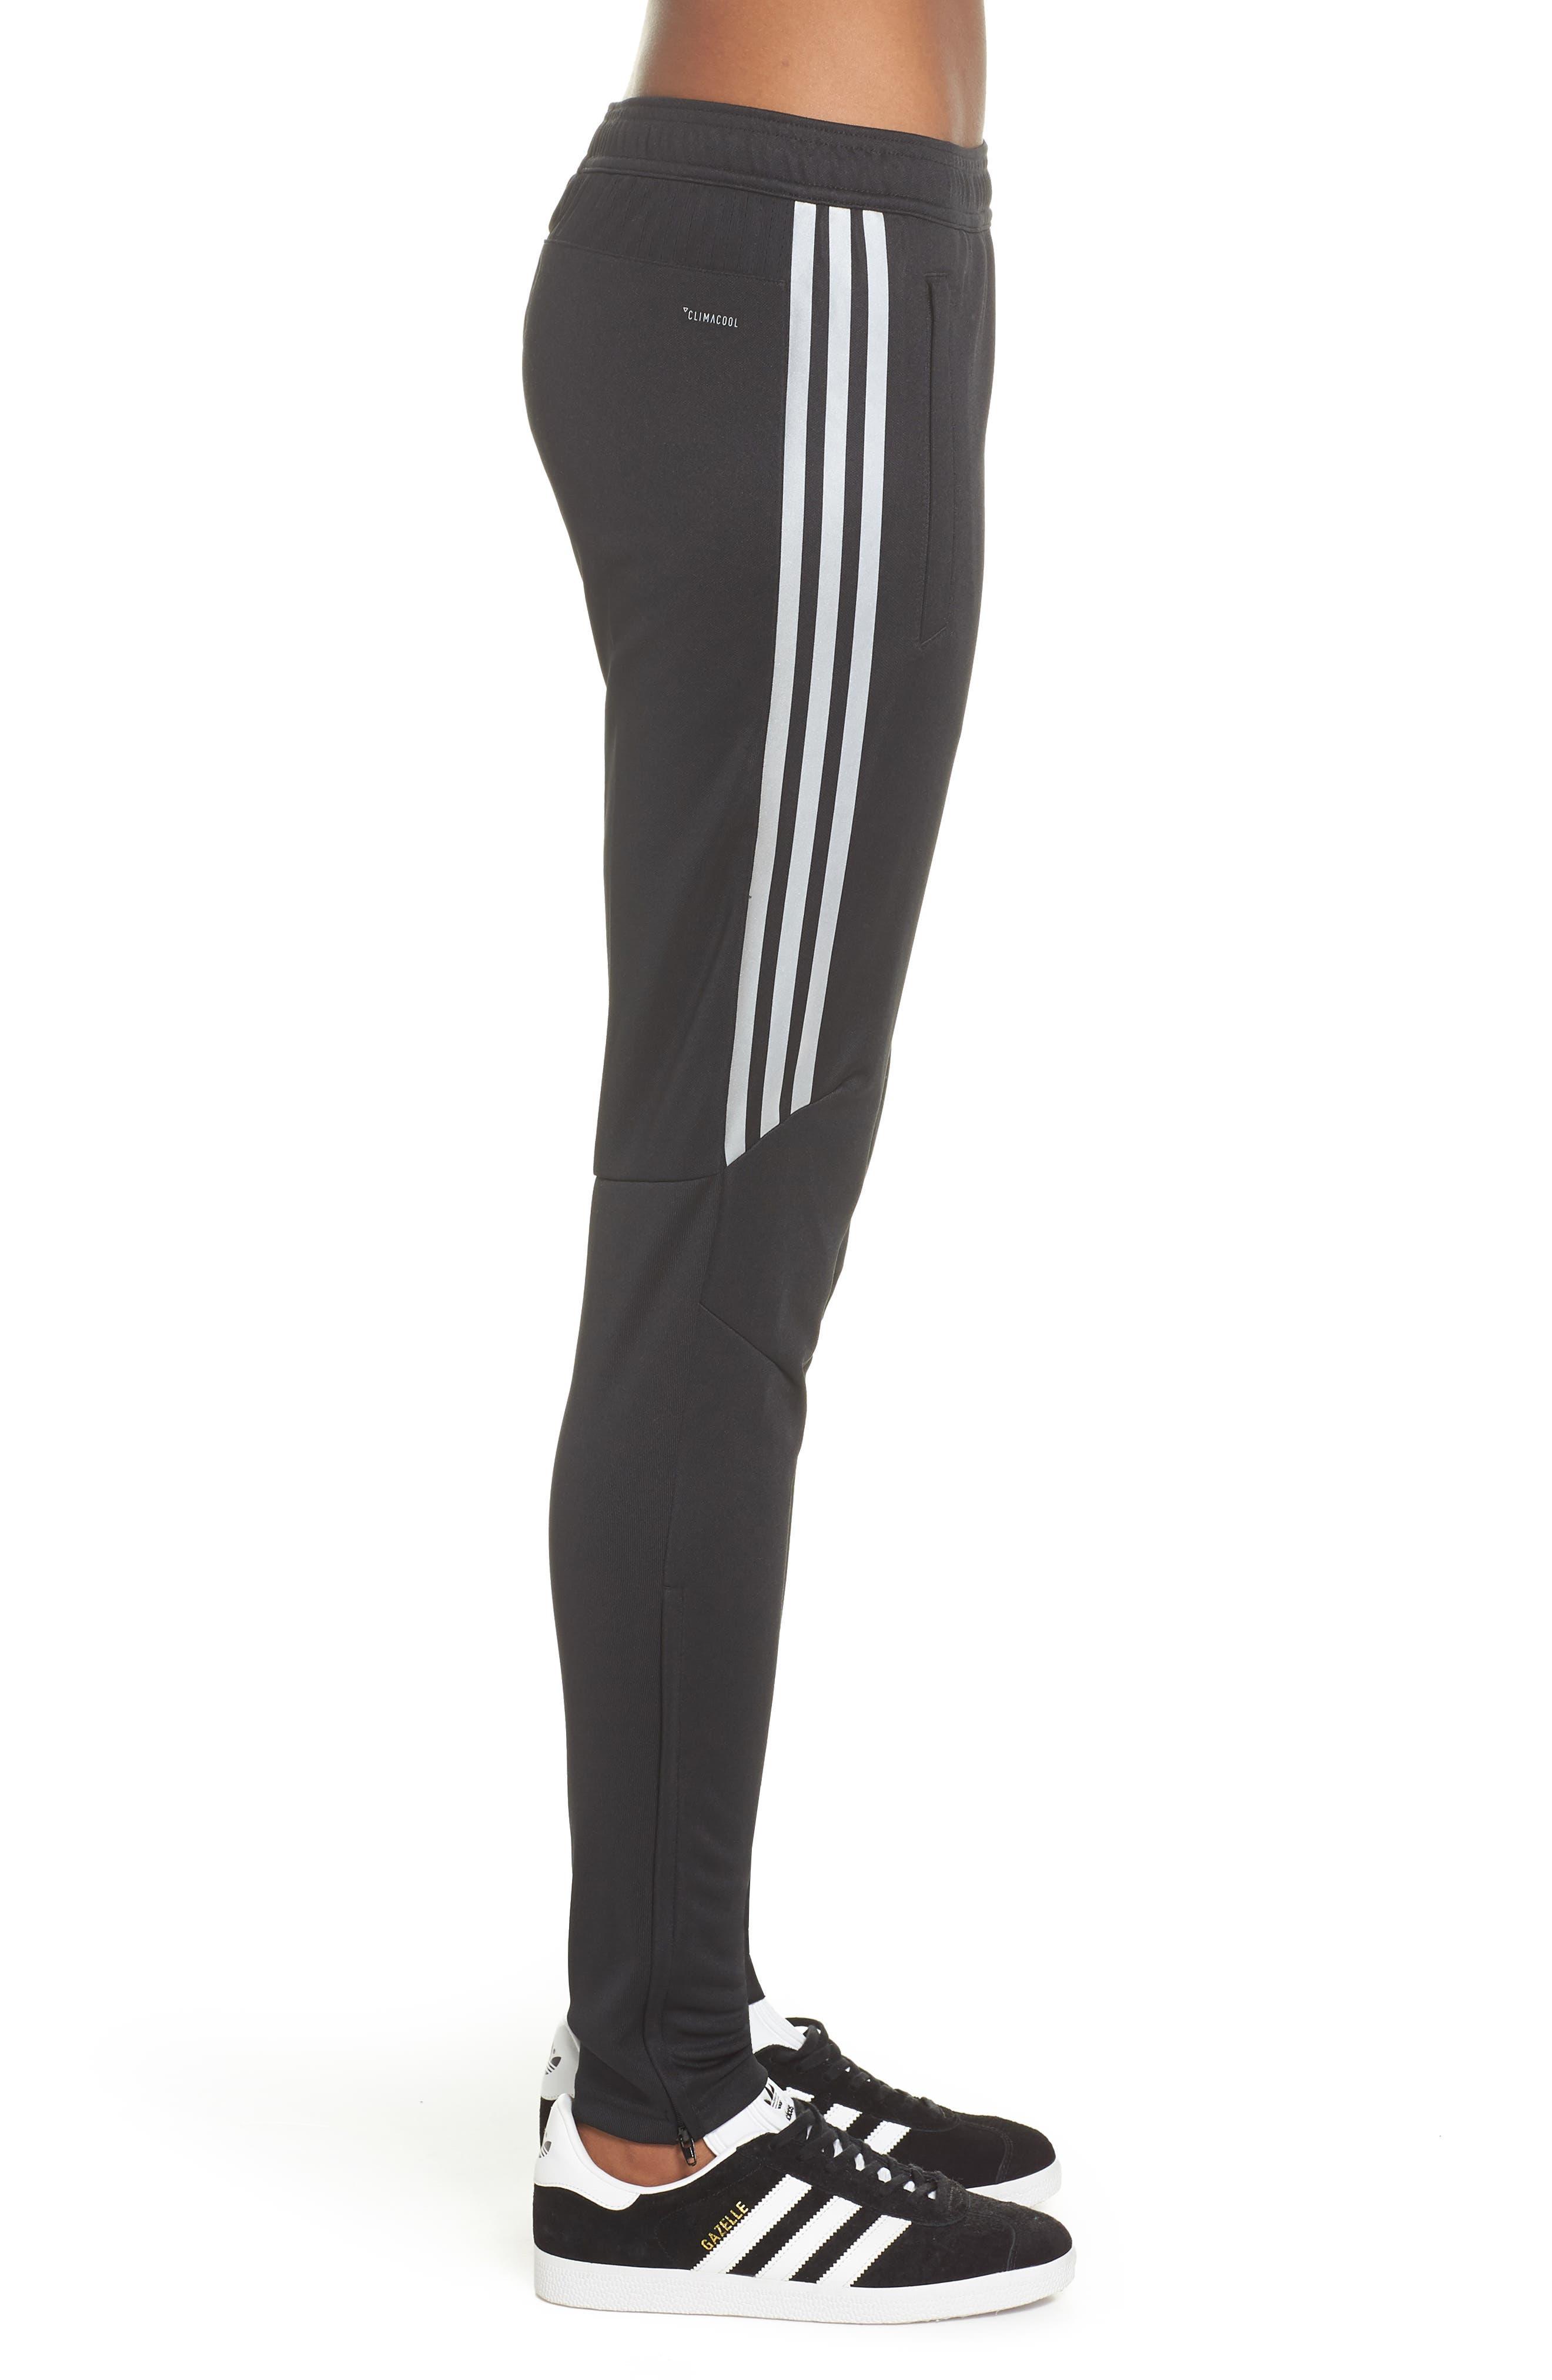 Tiro 17 Training Pants,                             Alternate thumbnail 3, color,                             BLACK/ REFLECTIVE SILVER